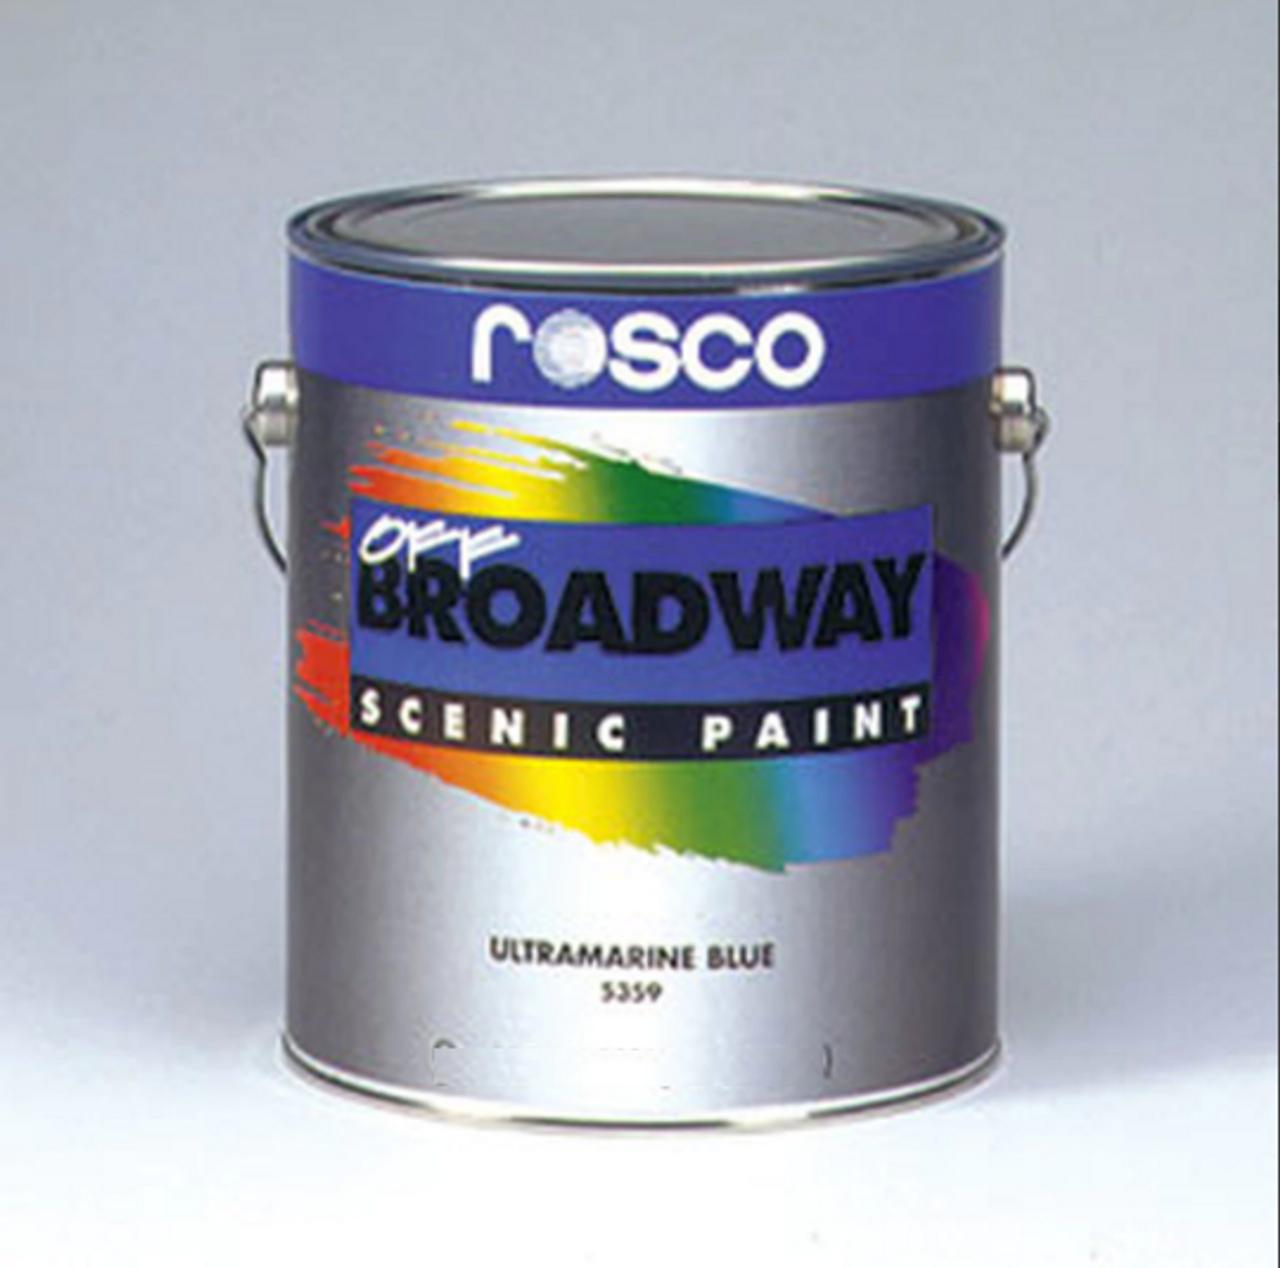 Rosco OFF BROADWAY (Quarts)